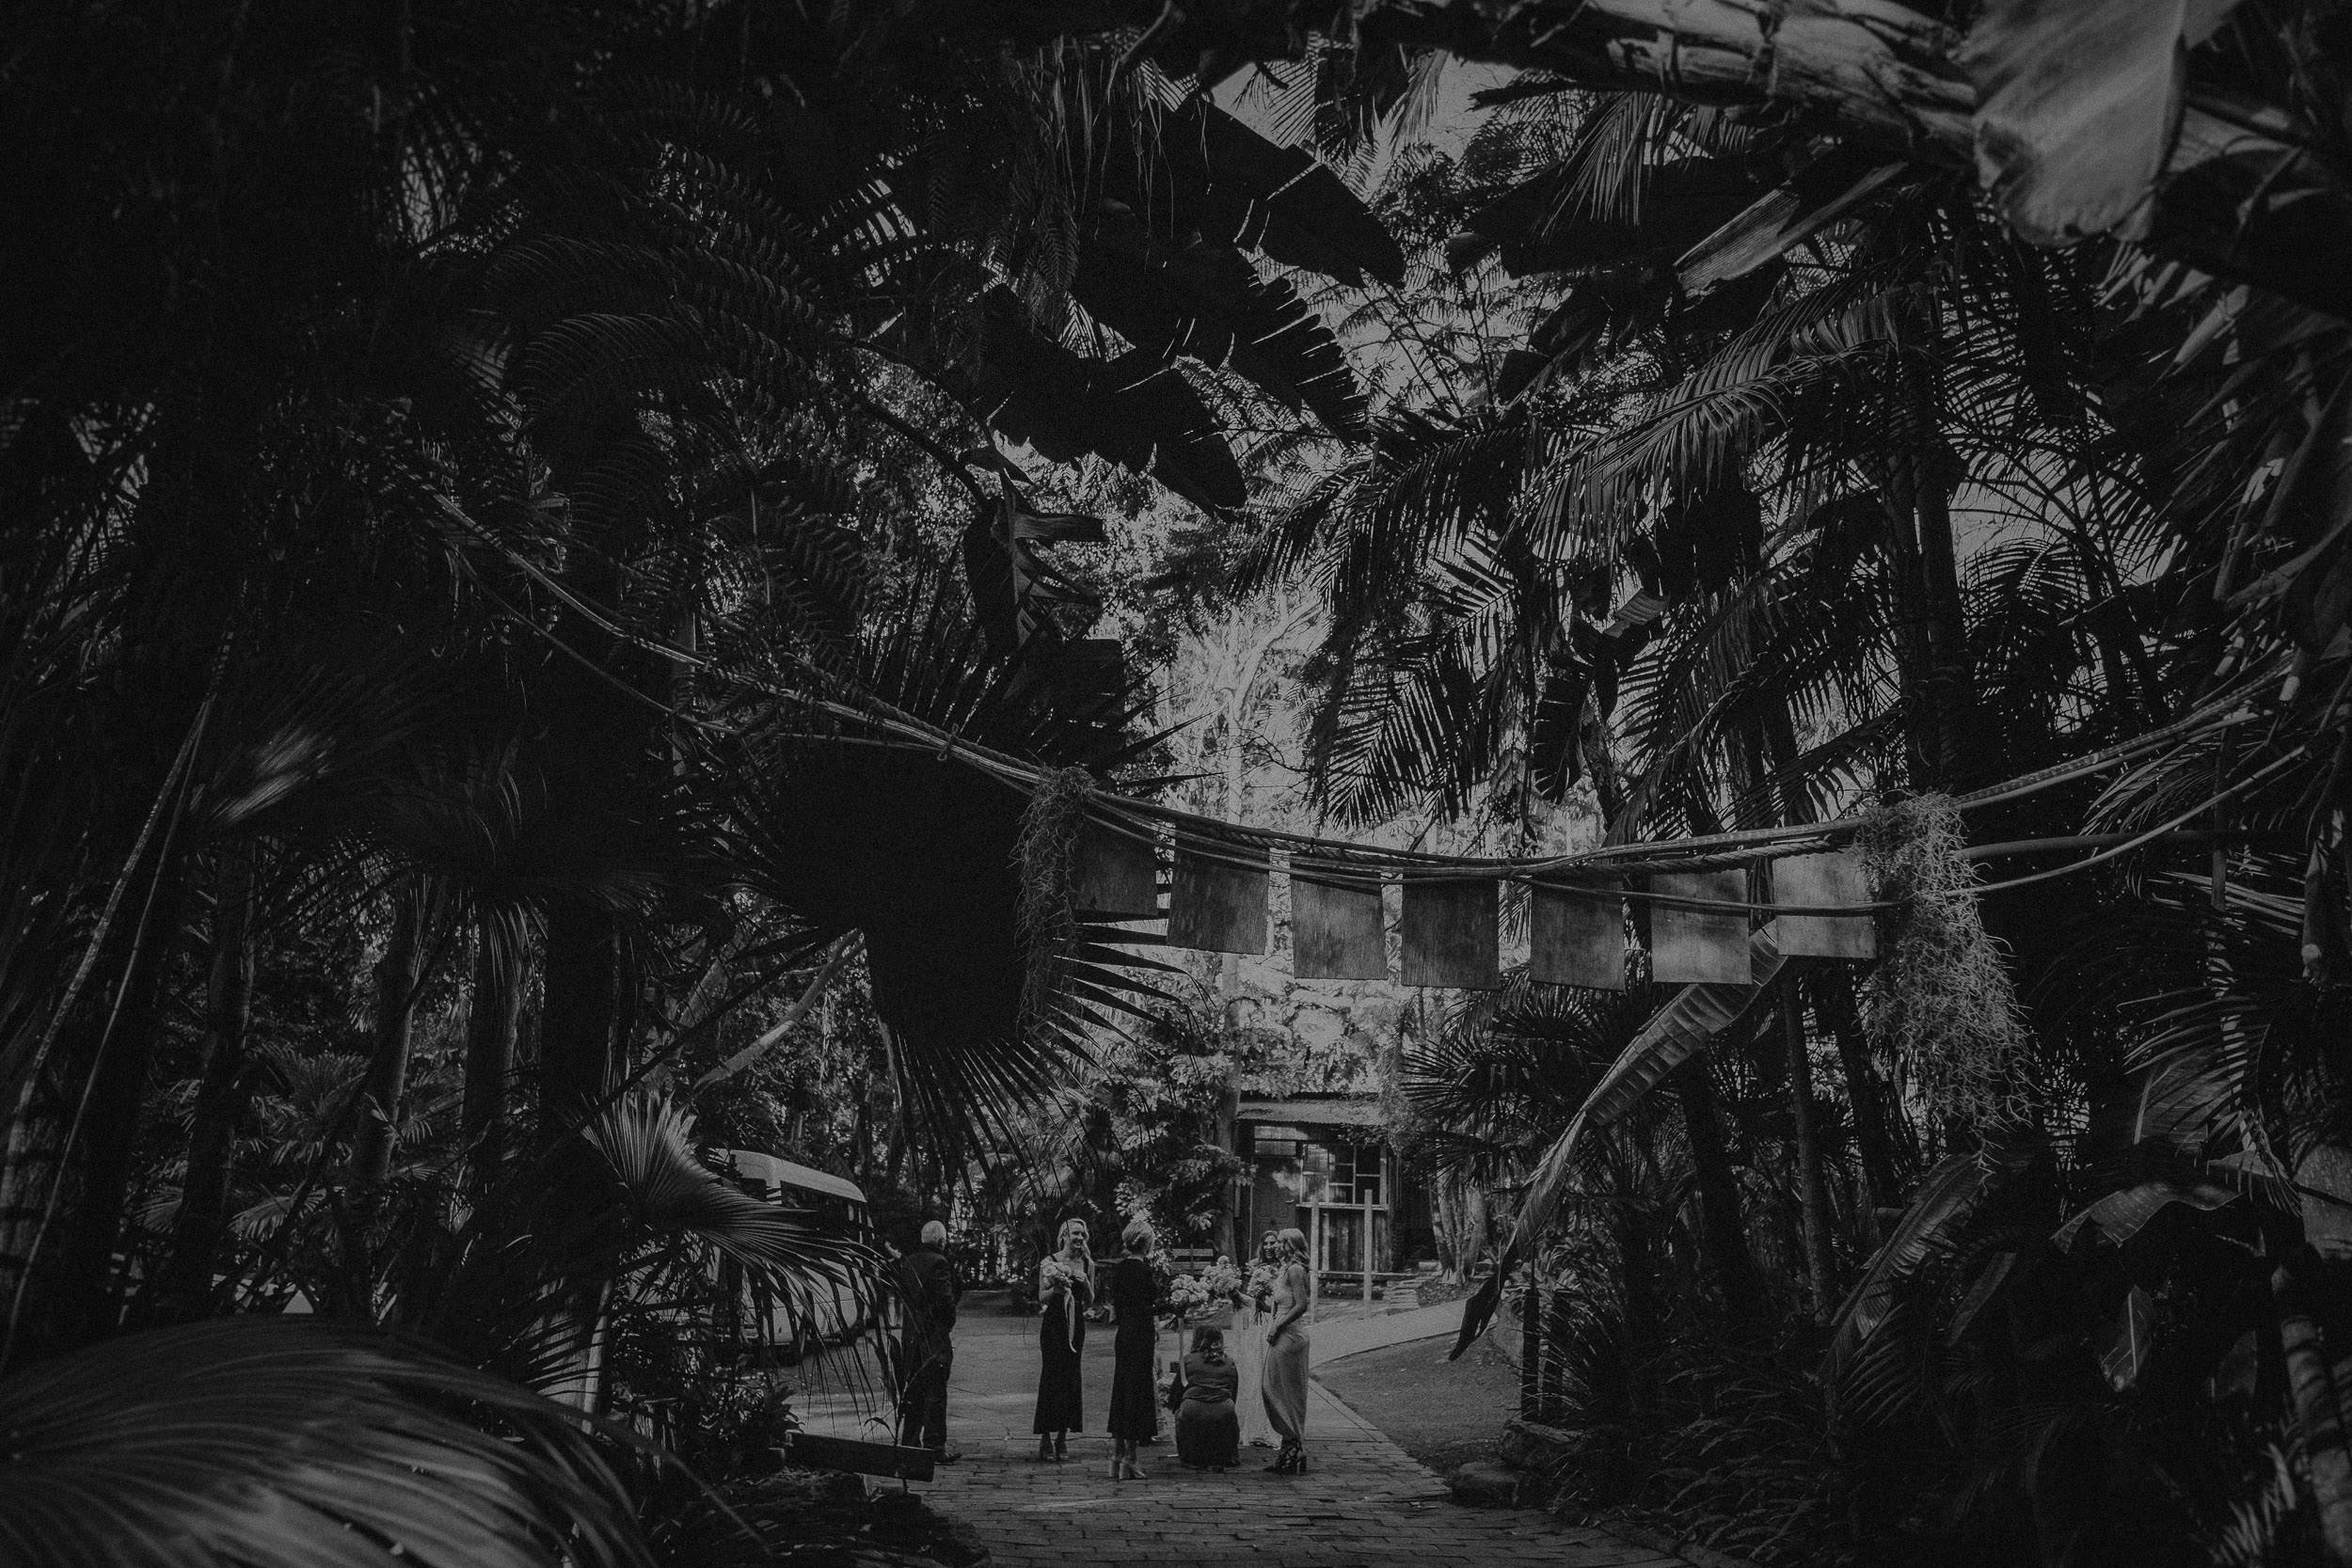 S&A Elopement - Kings & Thieves - Shred 'Til Dead - Central Coast Beach Forest Wedding - 152.jpg